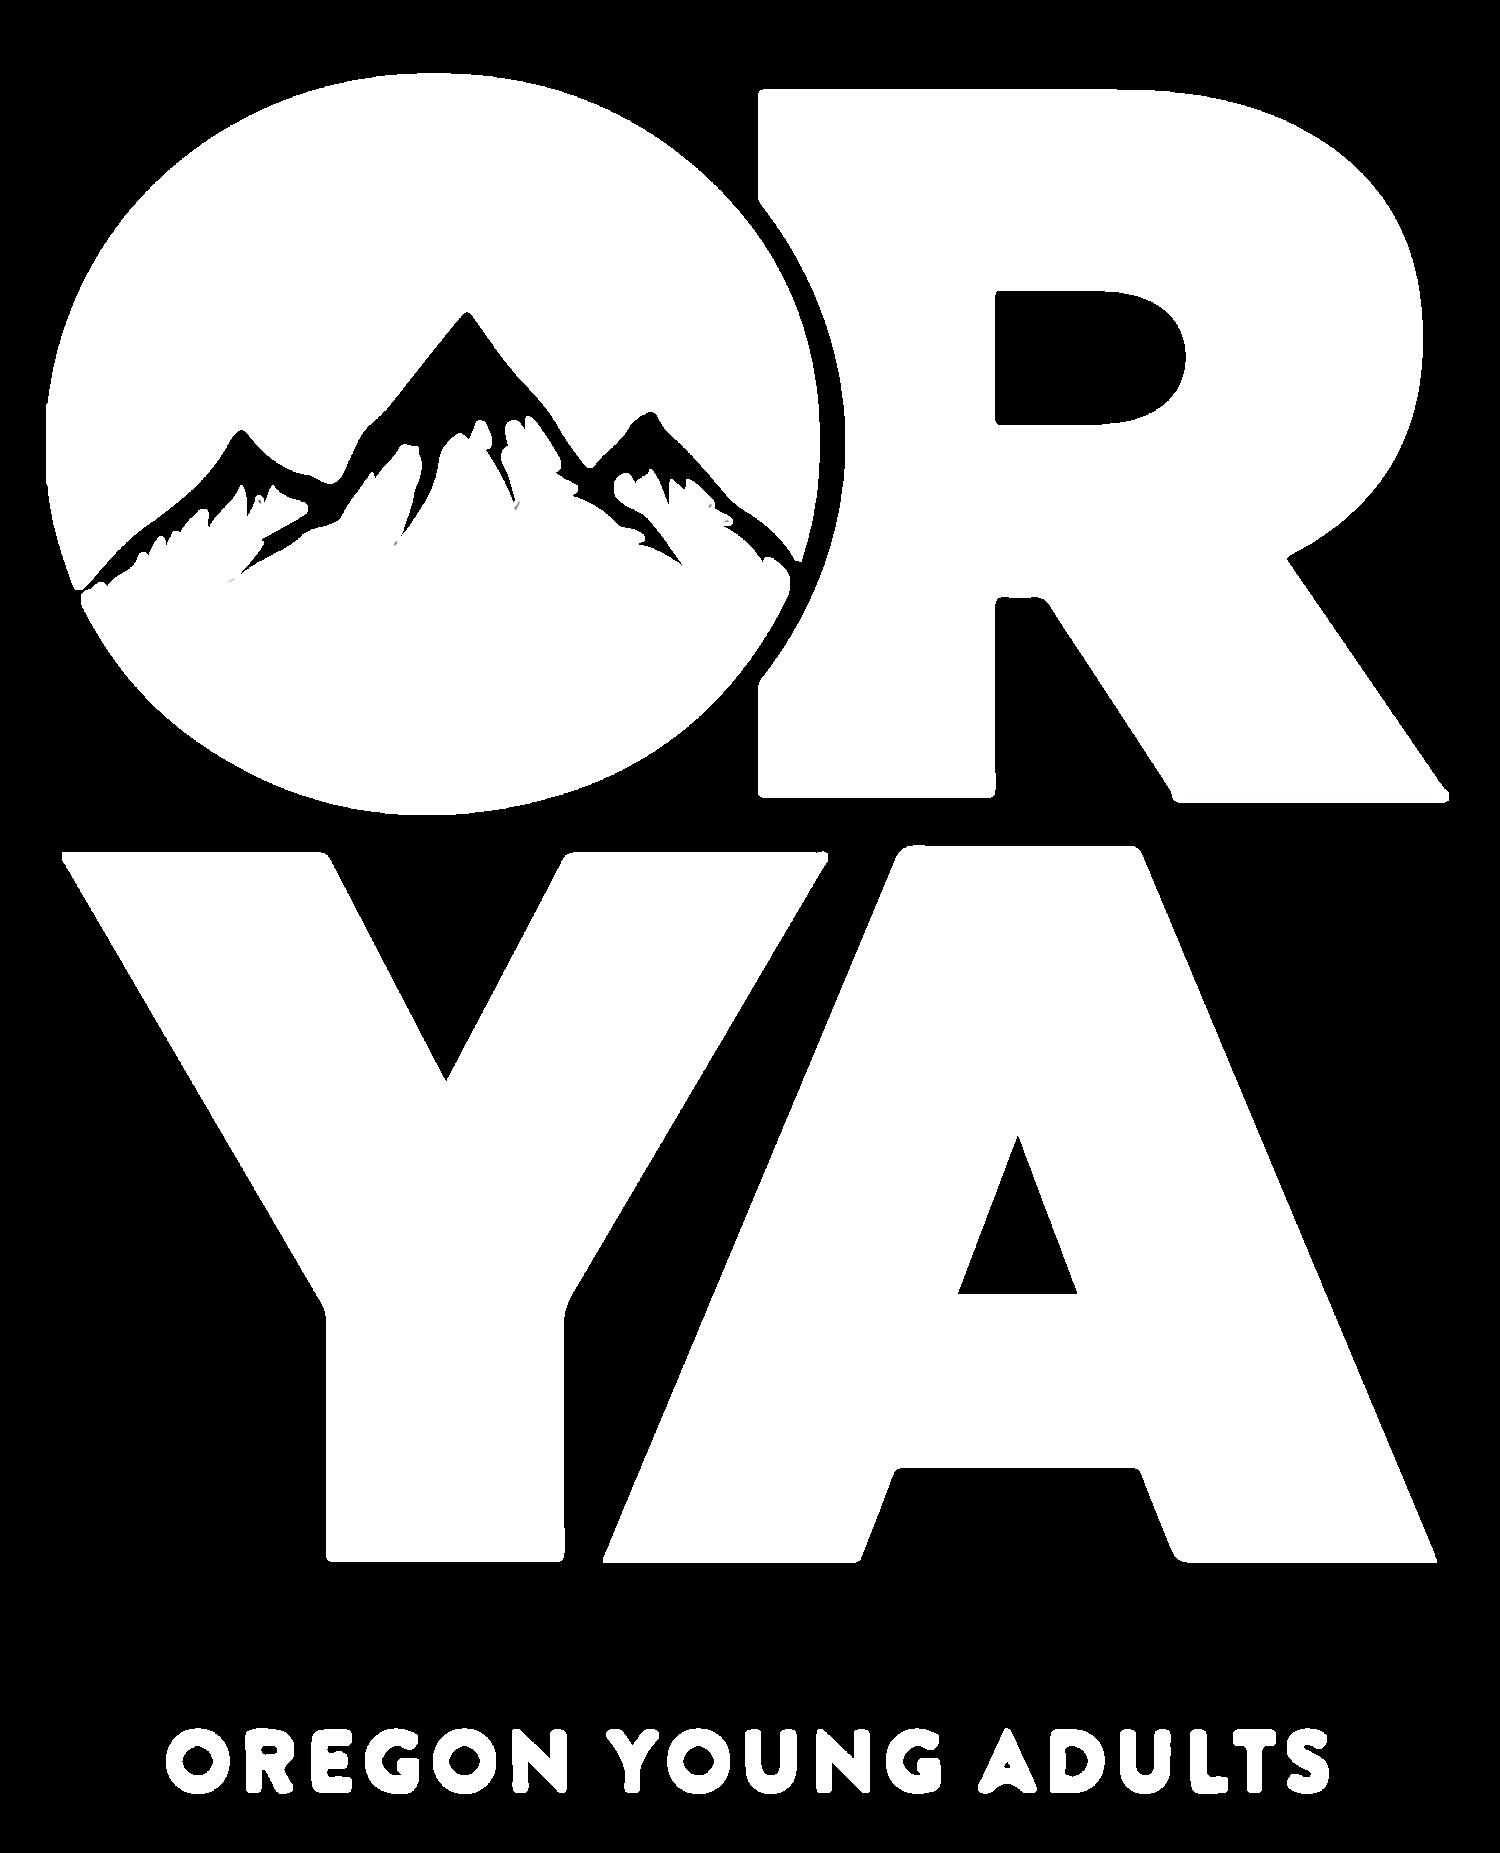 Oregon Young Adult logo